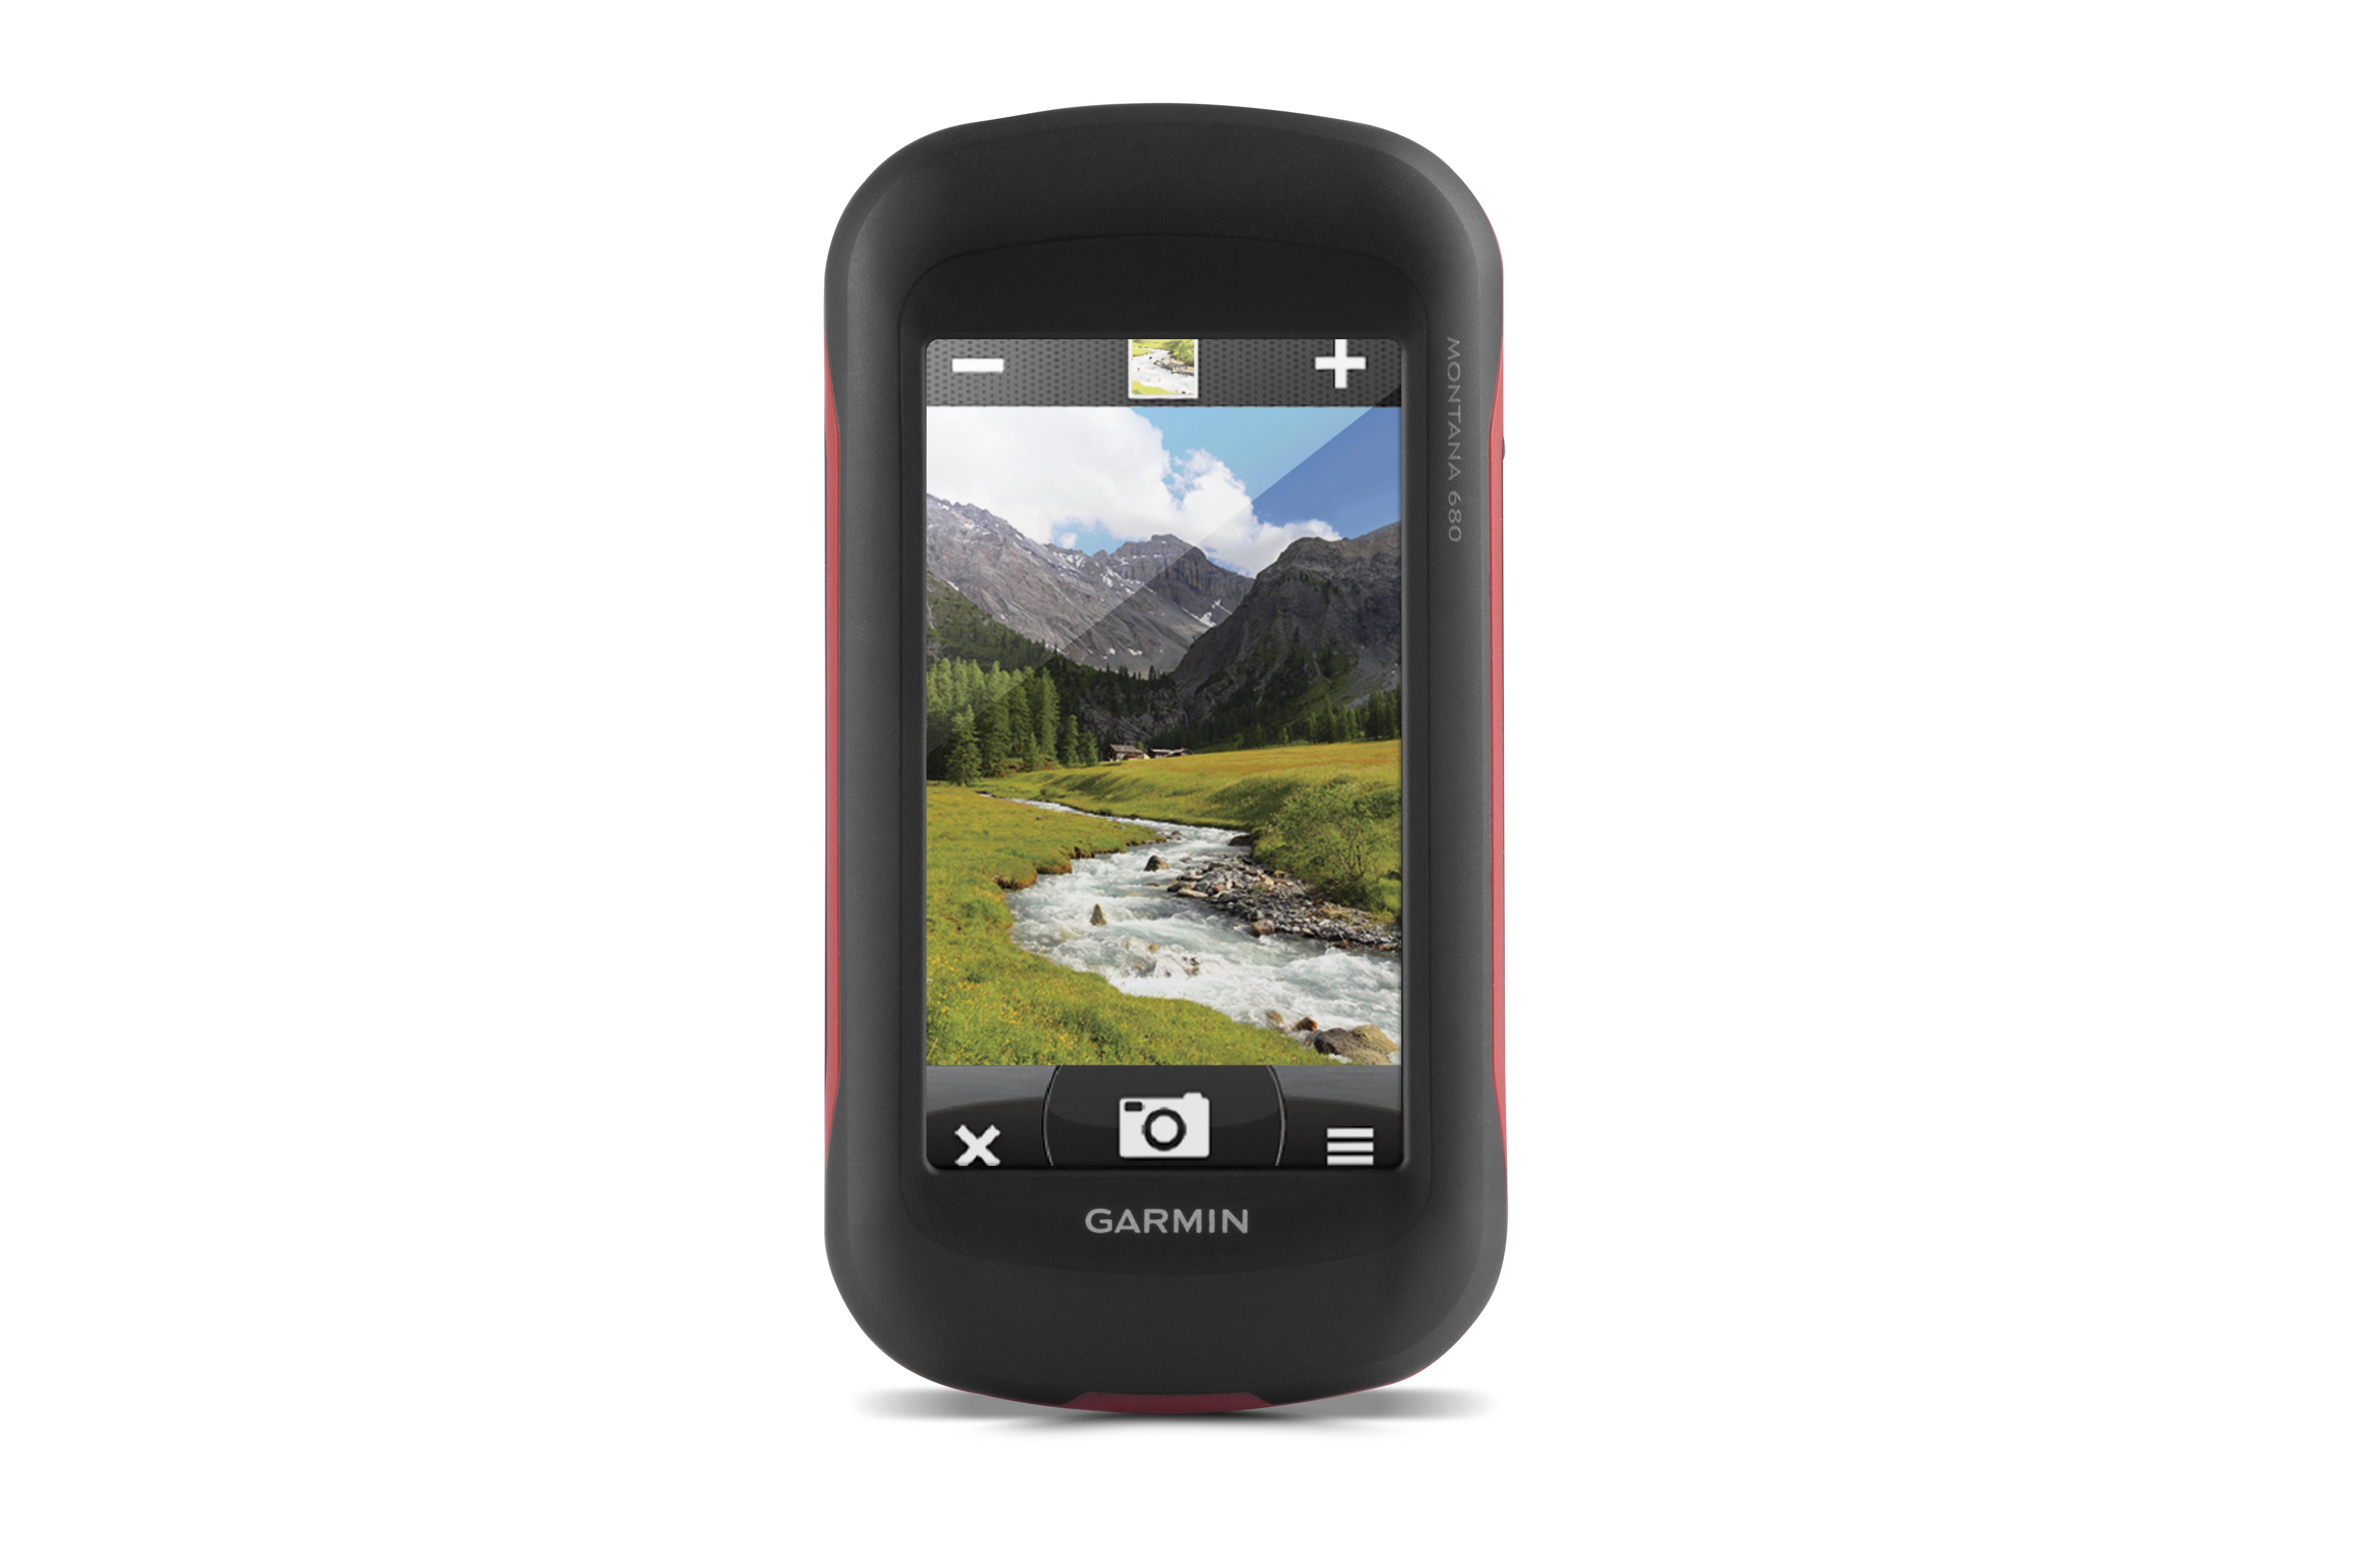 garmin updates montana line of handhelds with an 8mp camera rh businesswire com garmin montana 680 user manual garmin montana 680 user manual